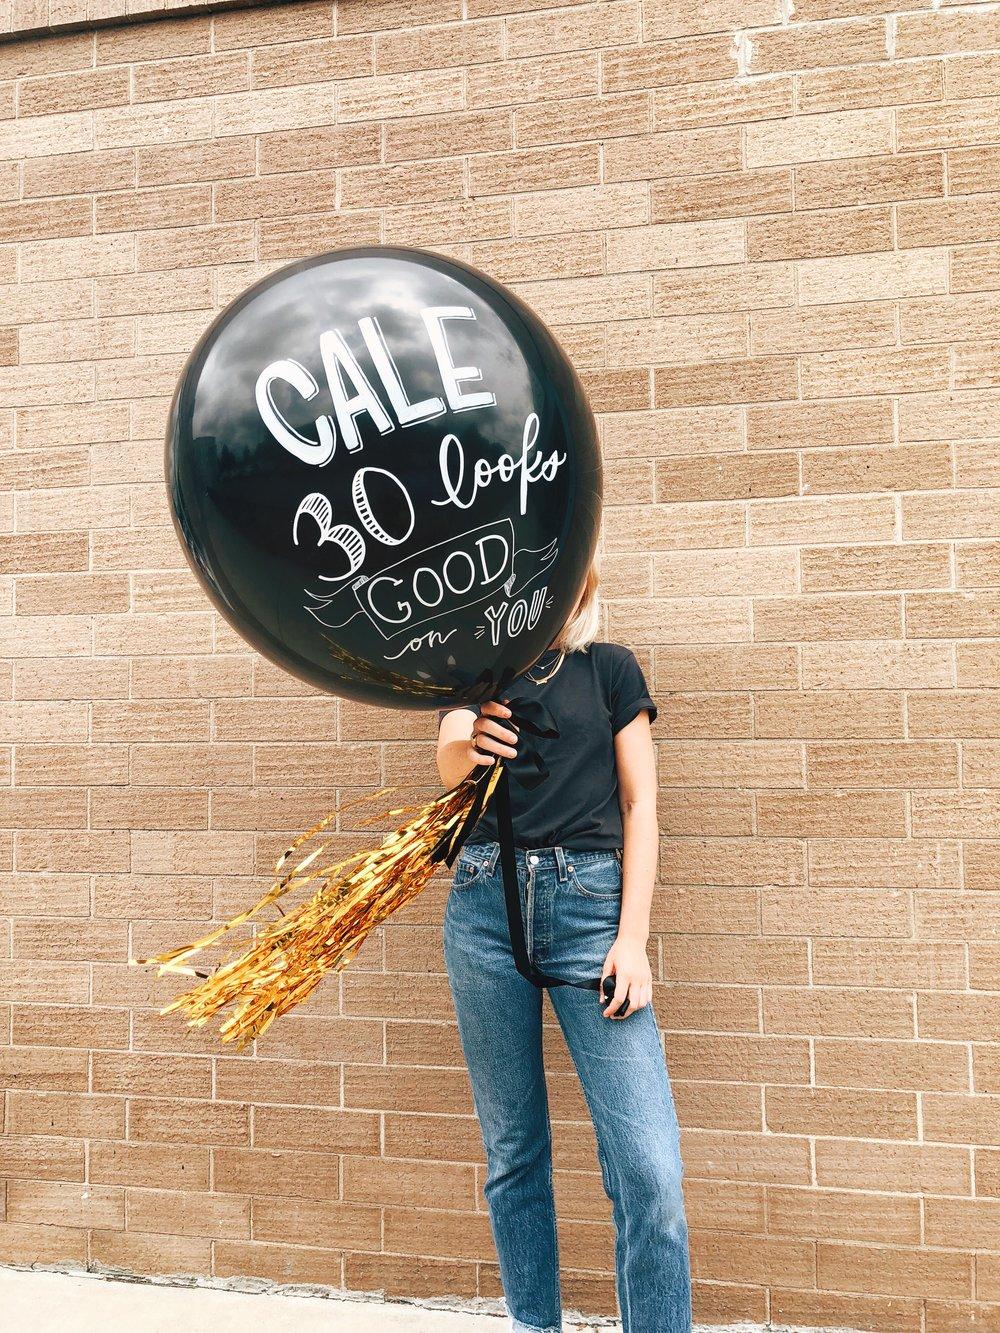 vroom_vroom_balloon_big_birthday_bespoke_hand_lettered_calligraphy_birthday_cale.JPG